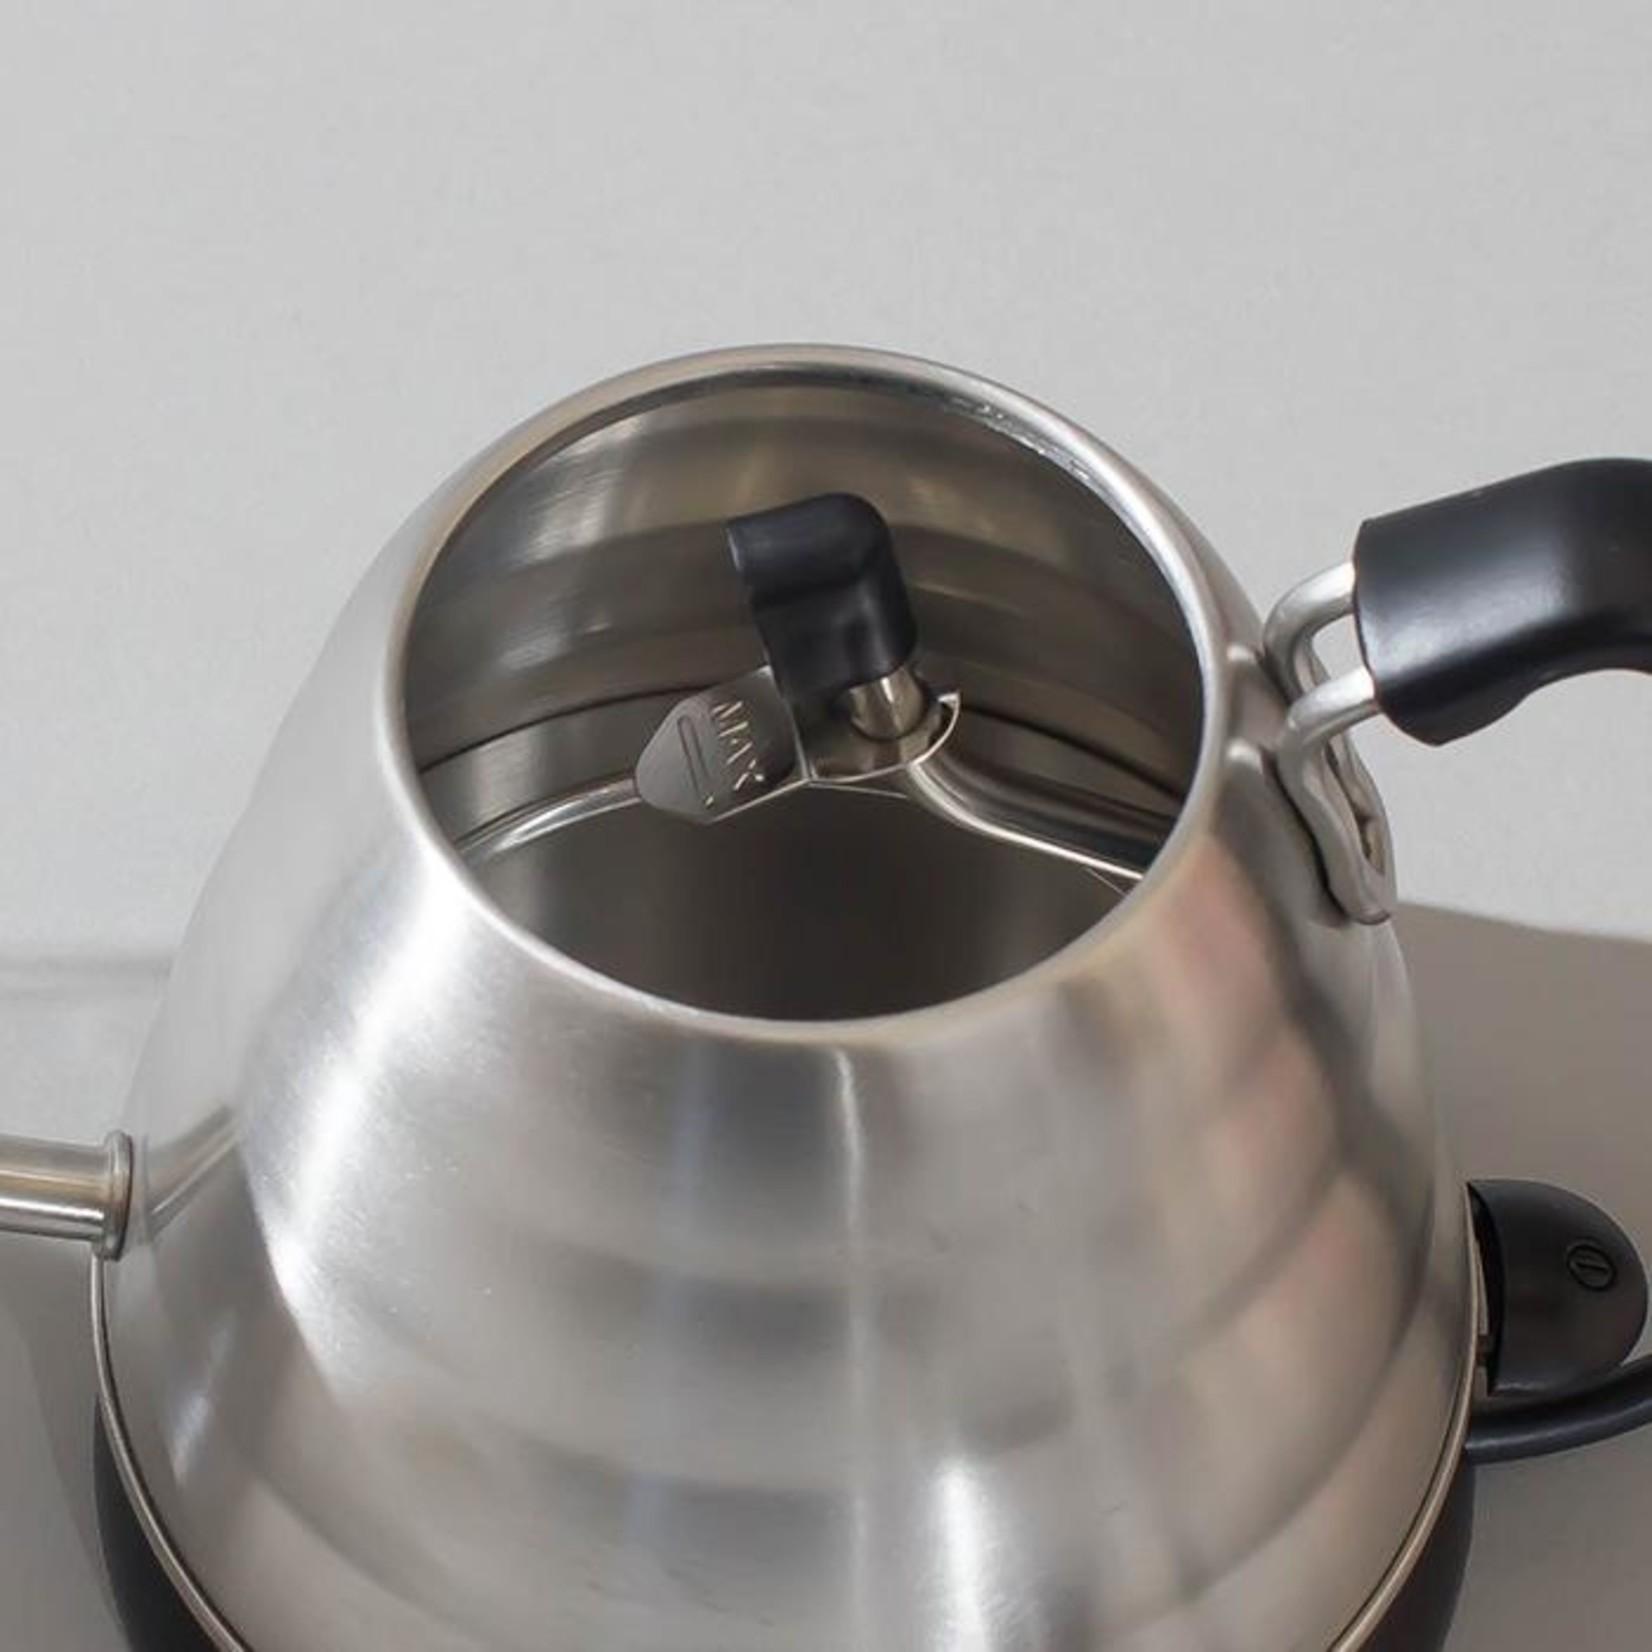 Hario Hario V60 Buono  Electric Kettle 0.8L